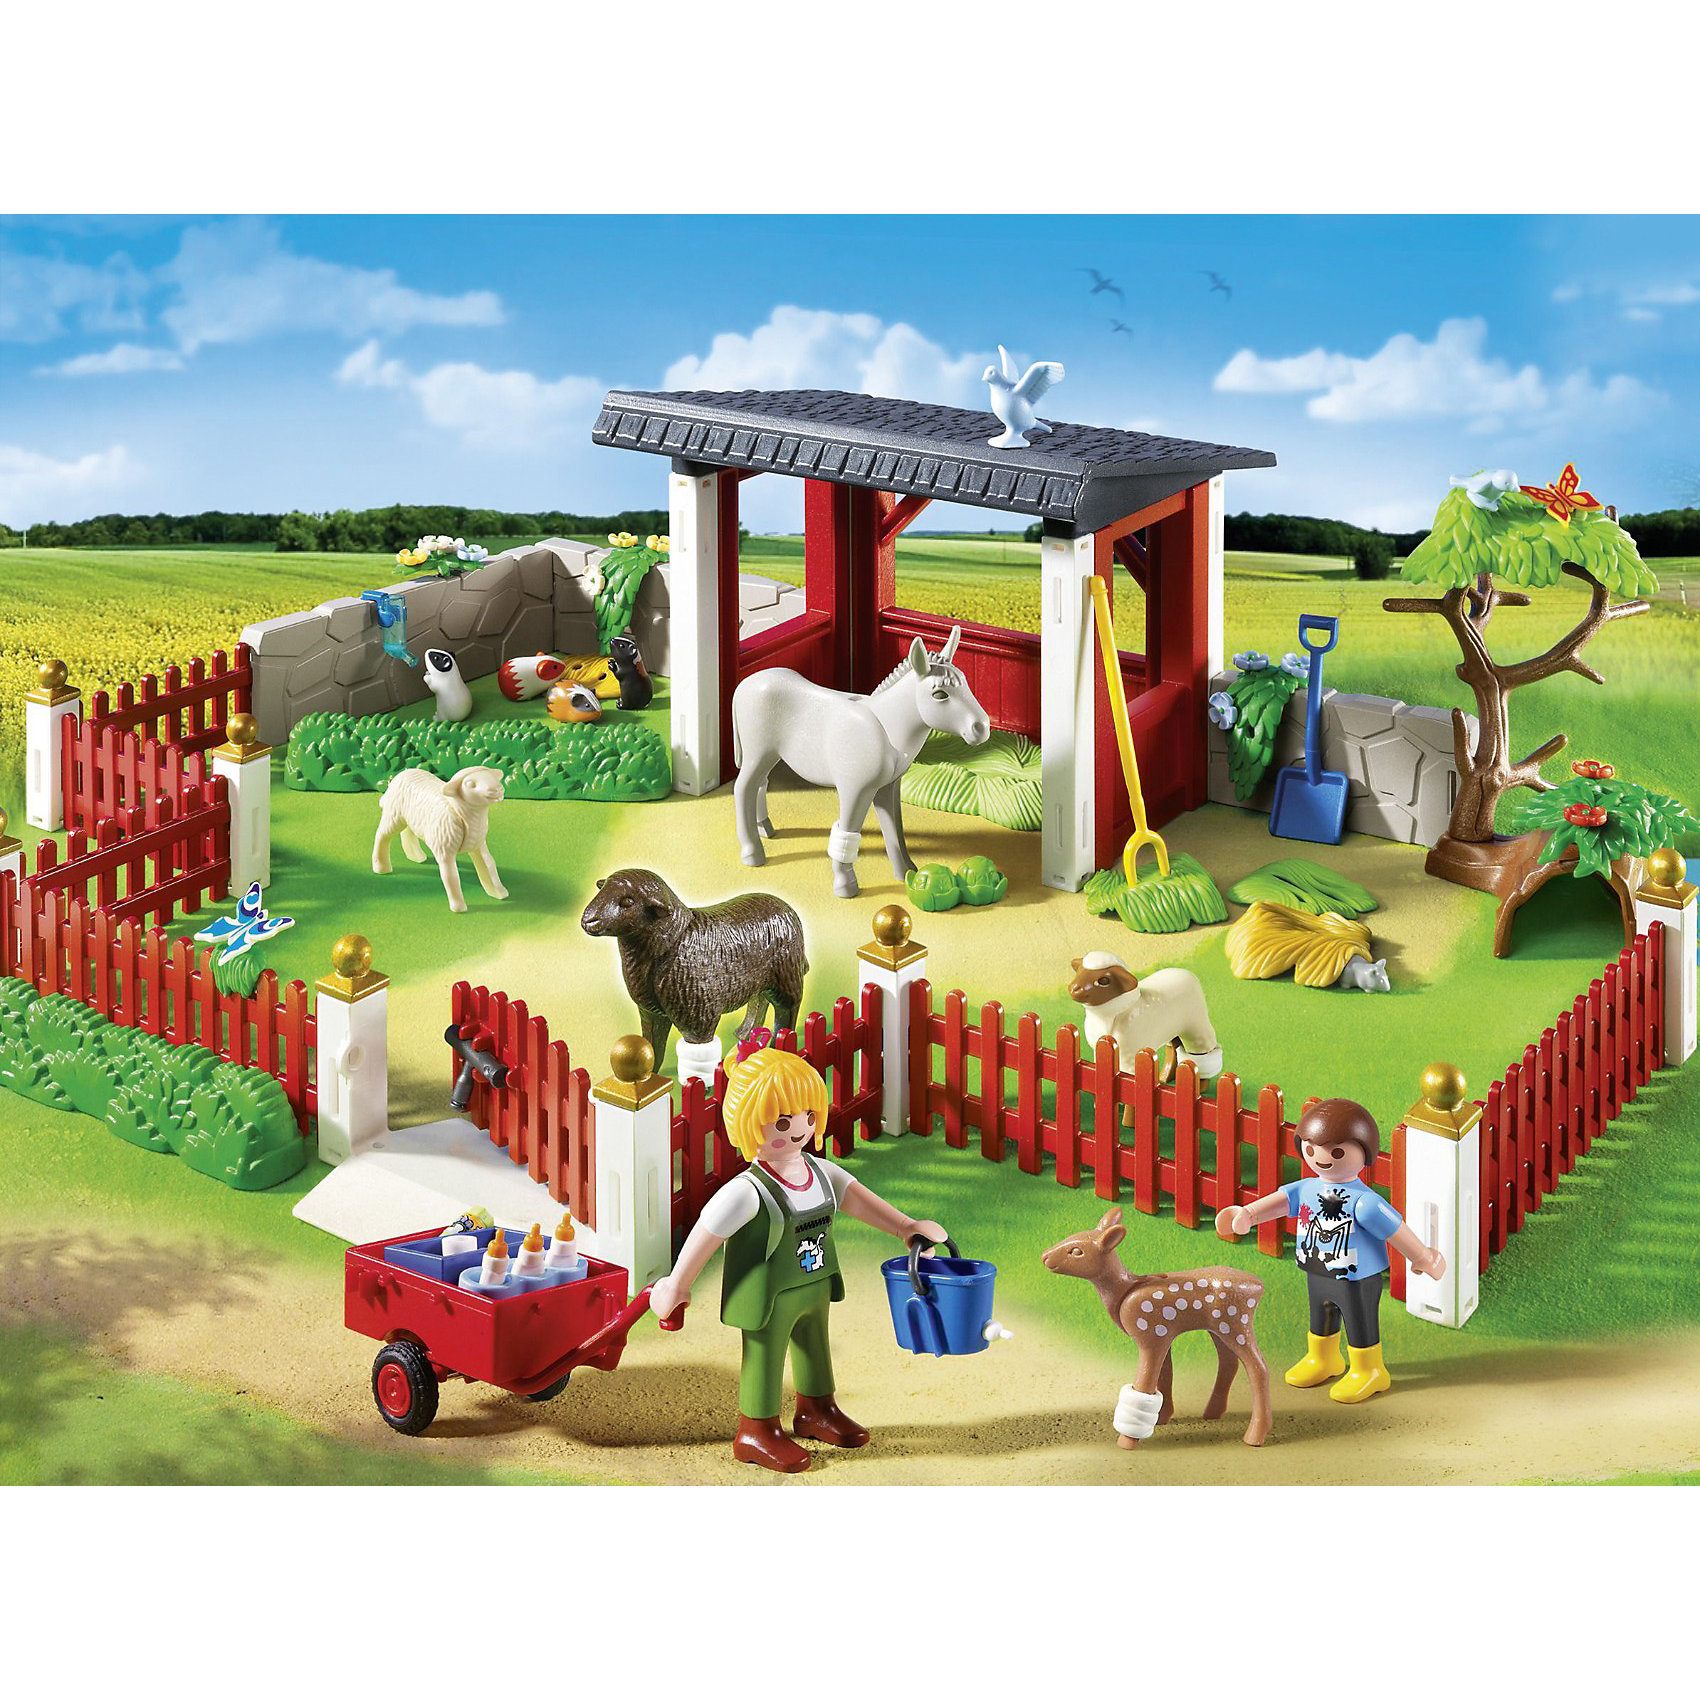 PLAYMOBIL® PLAYMOBIL 5531 Ветеринарная клиника: Уход за животными playmobil® детская клиника рентгеновский кабинет playmobil